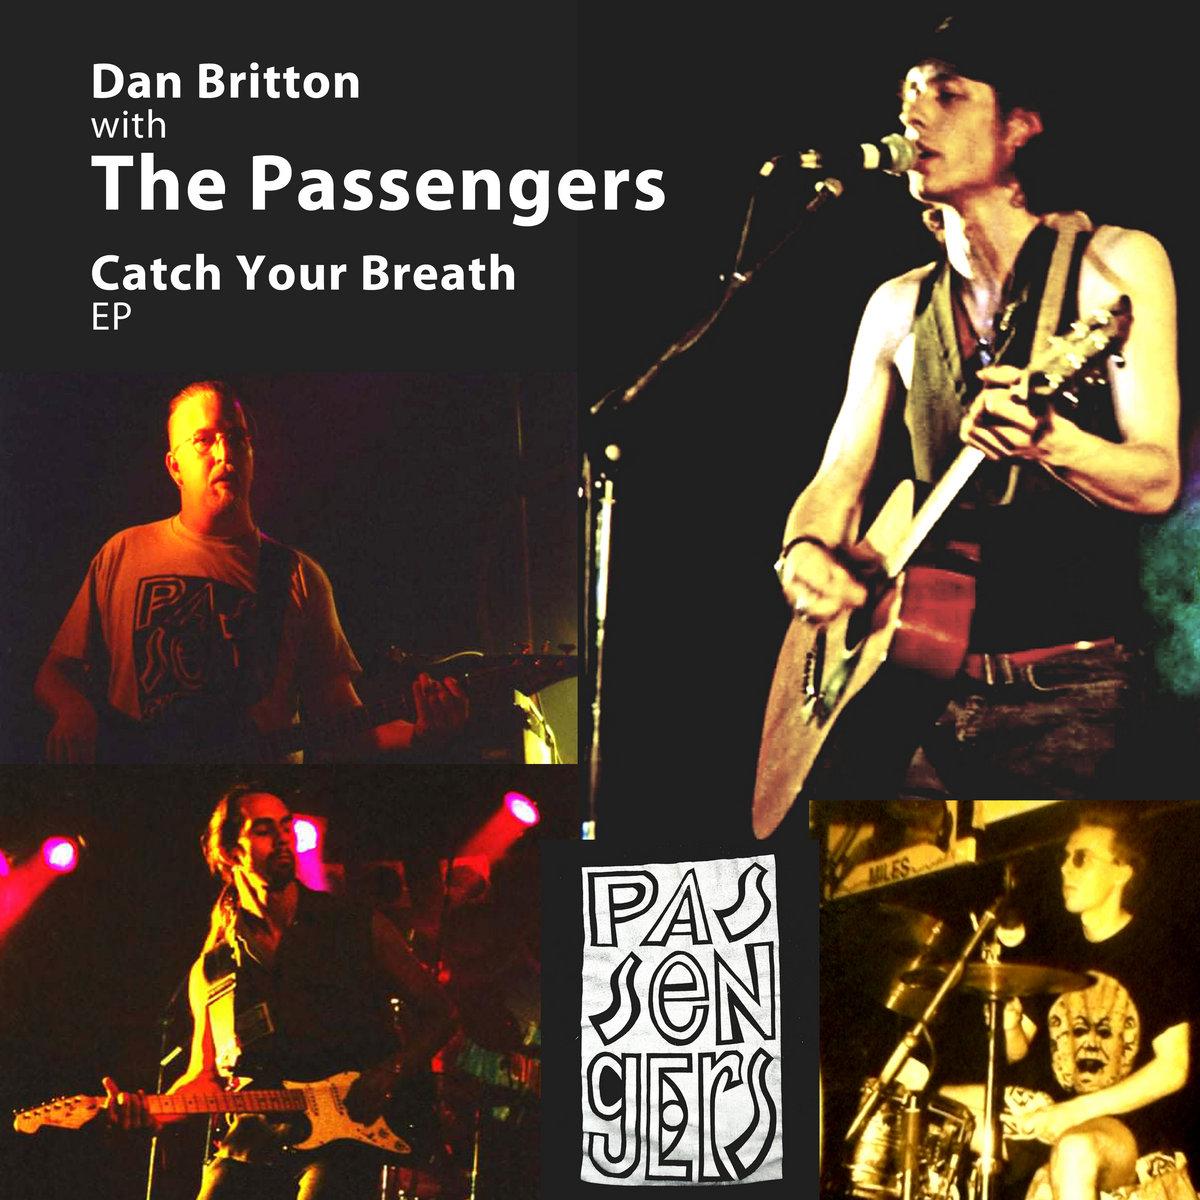 Dan Britton - Passengers EP